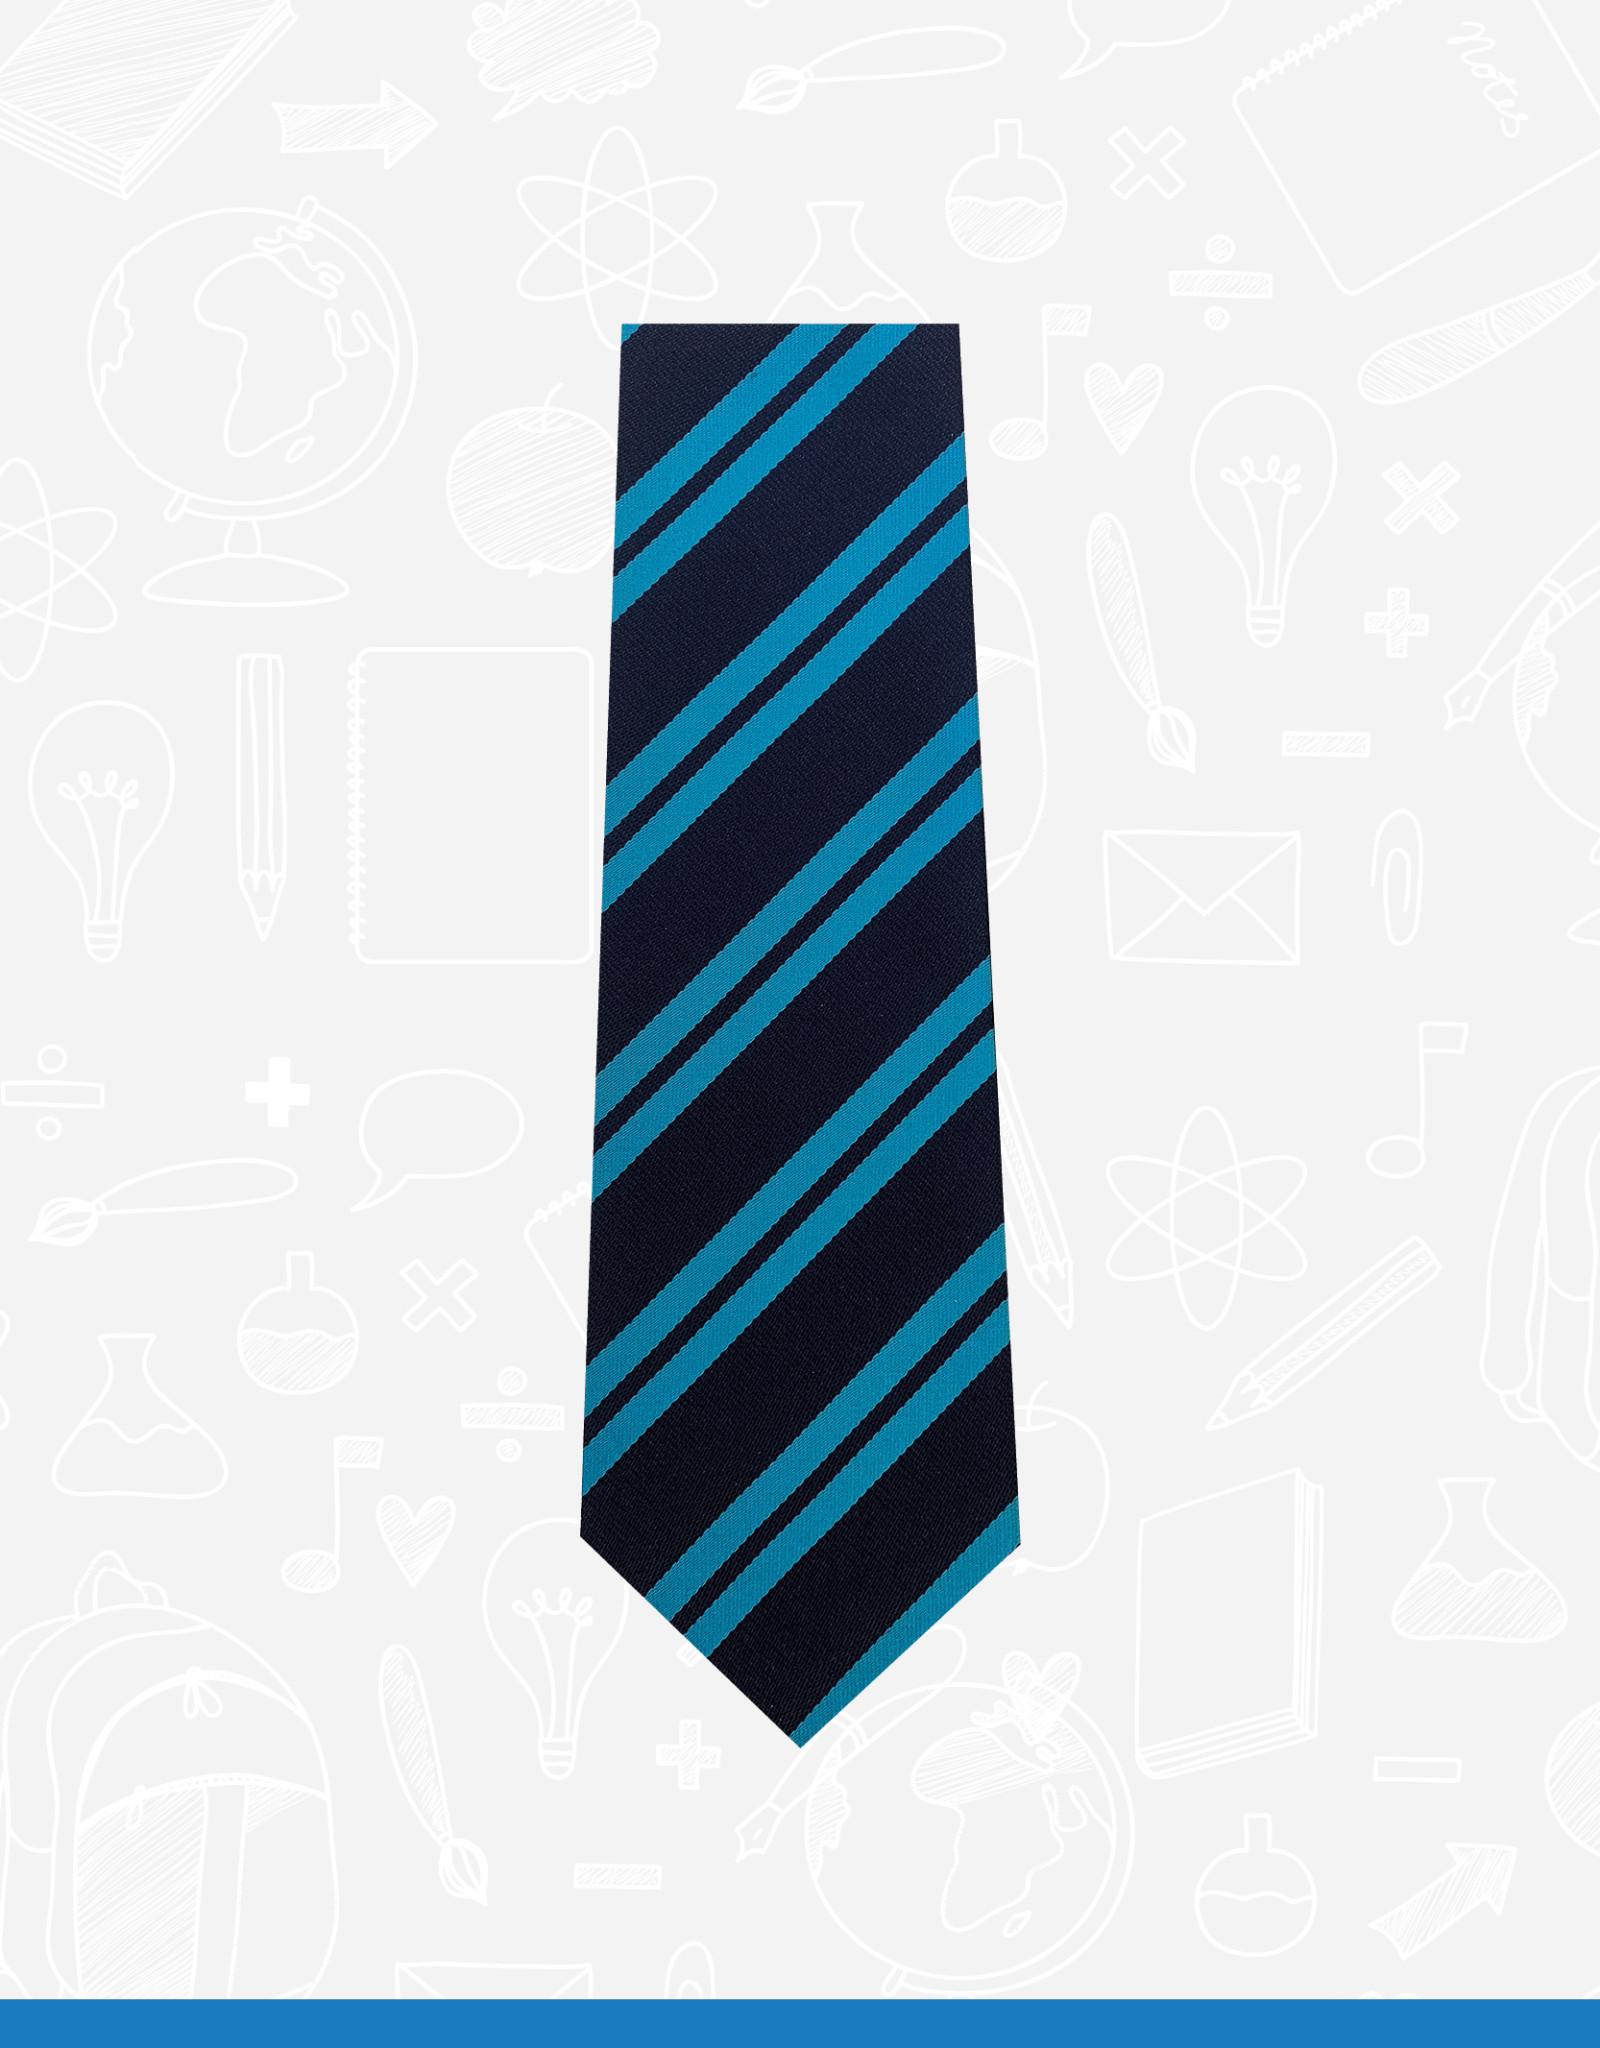 TSW Ties Bangor Academy 1st - 5th Form Tie